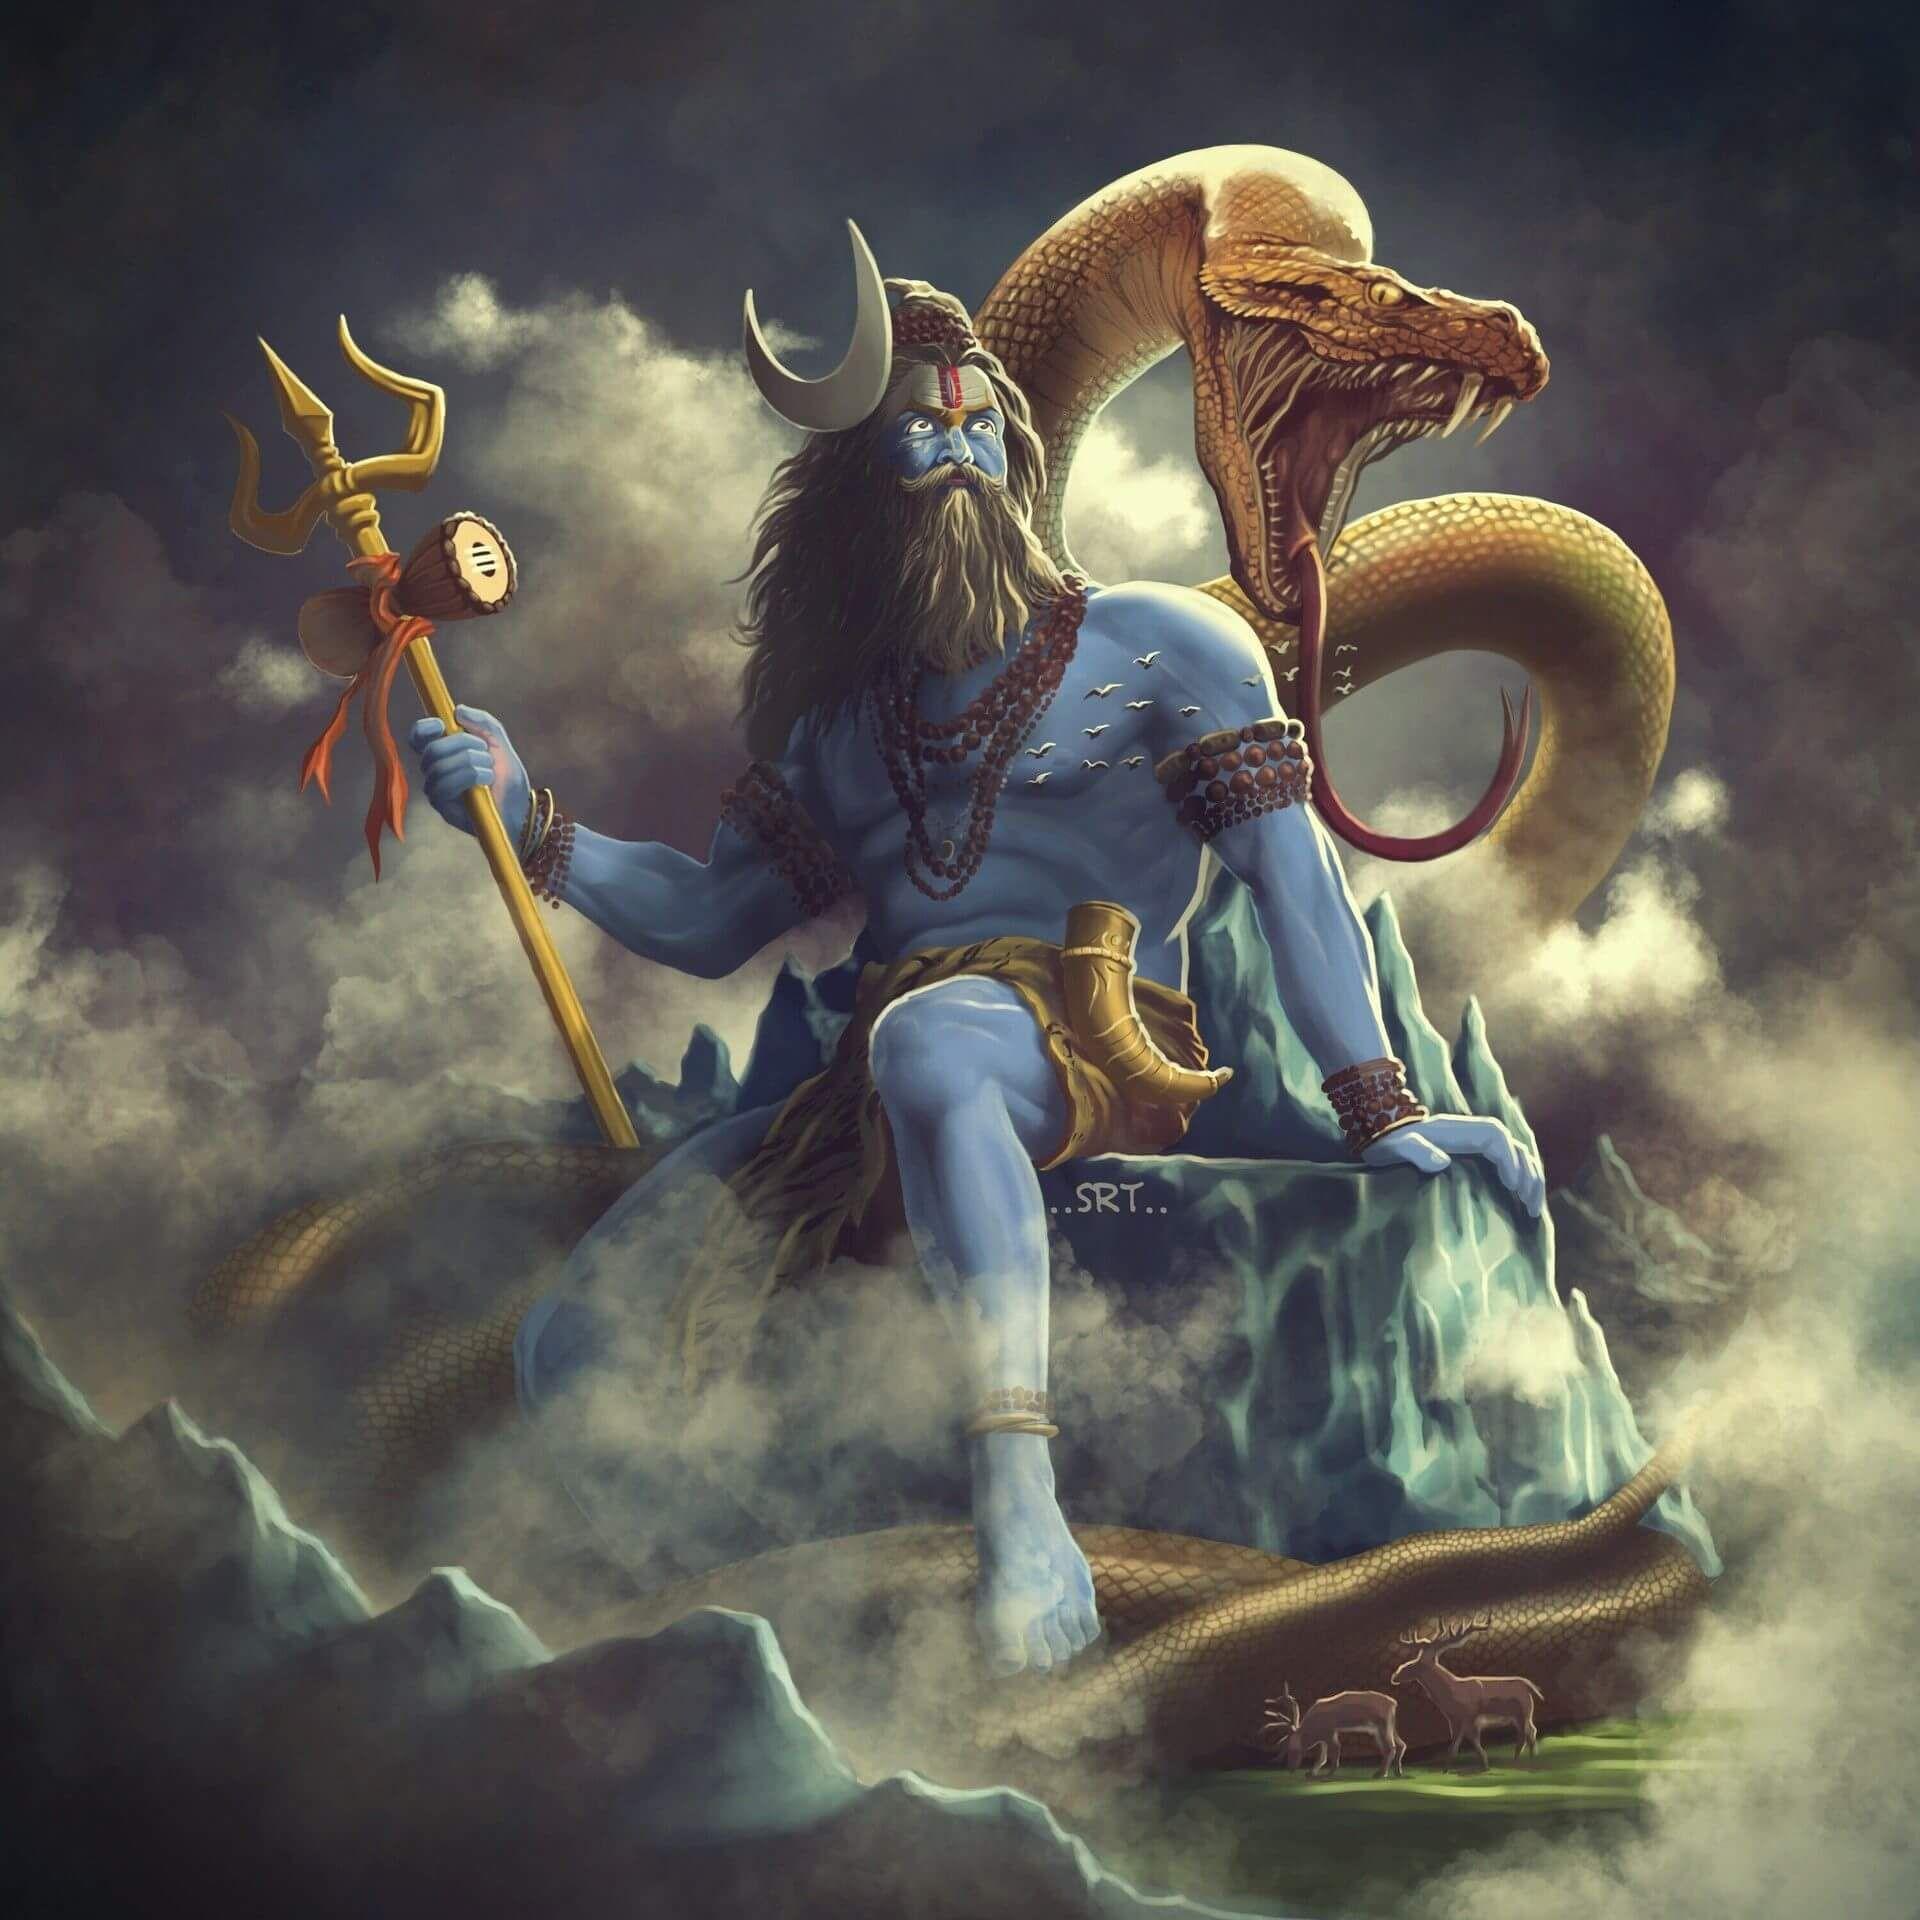 Lord Shiva In 2020 Shiva Angry Lord Shiva Hd Wallpaper Lord Shiva Pics